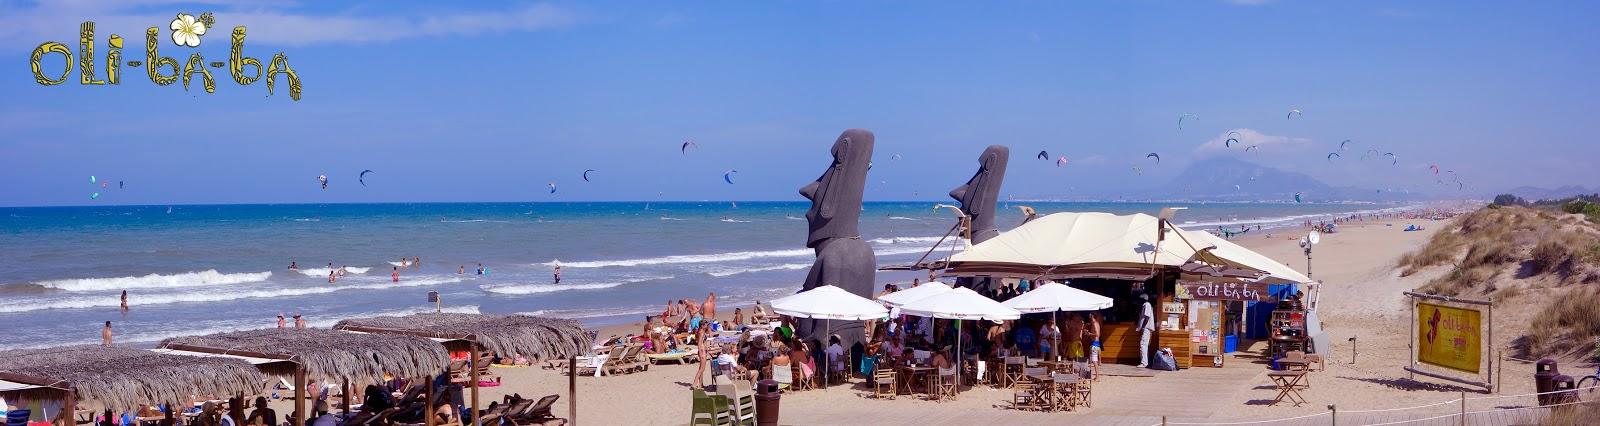 Resultado de imagen de oli ba ba playa oliva